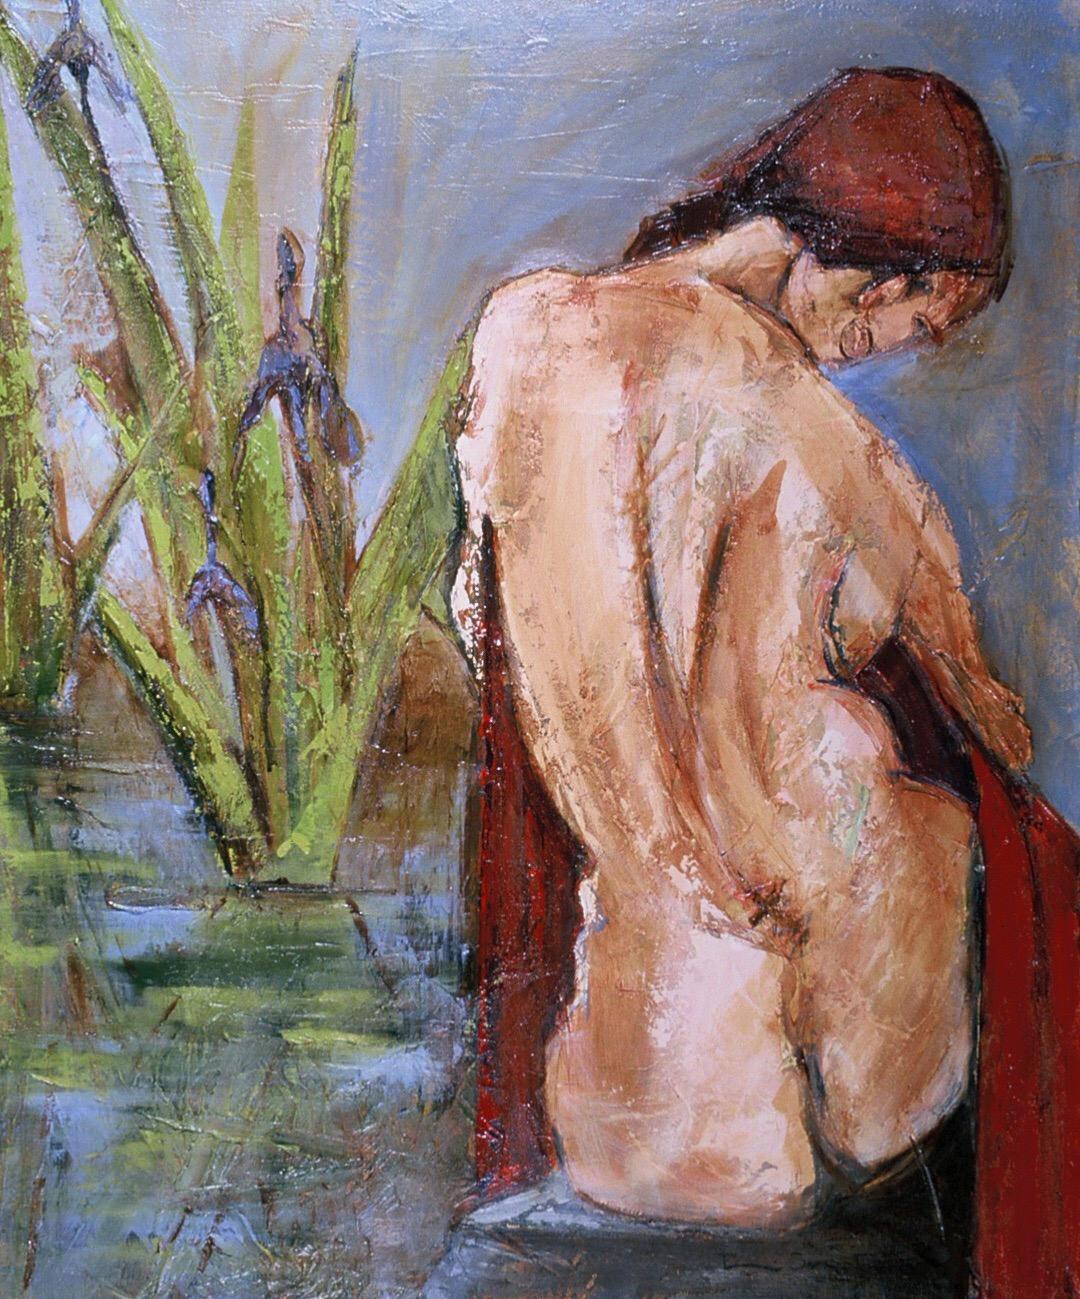 The Iris Pond by Denise Souza Finney